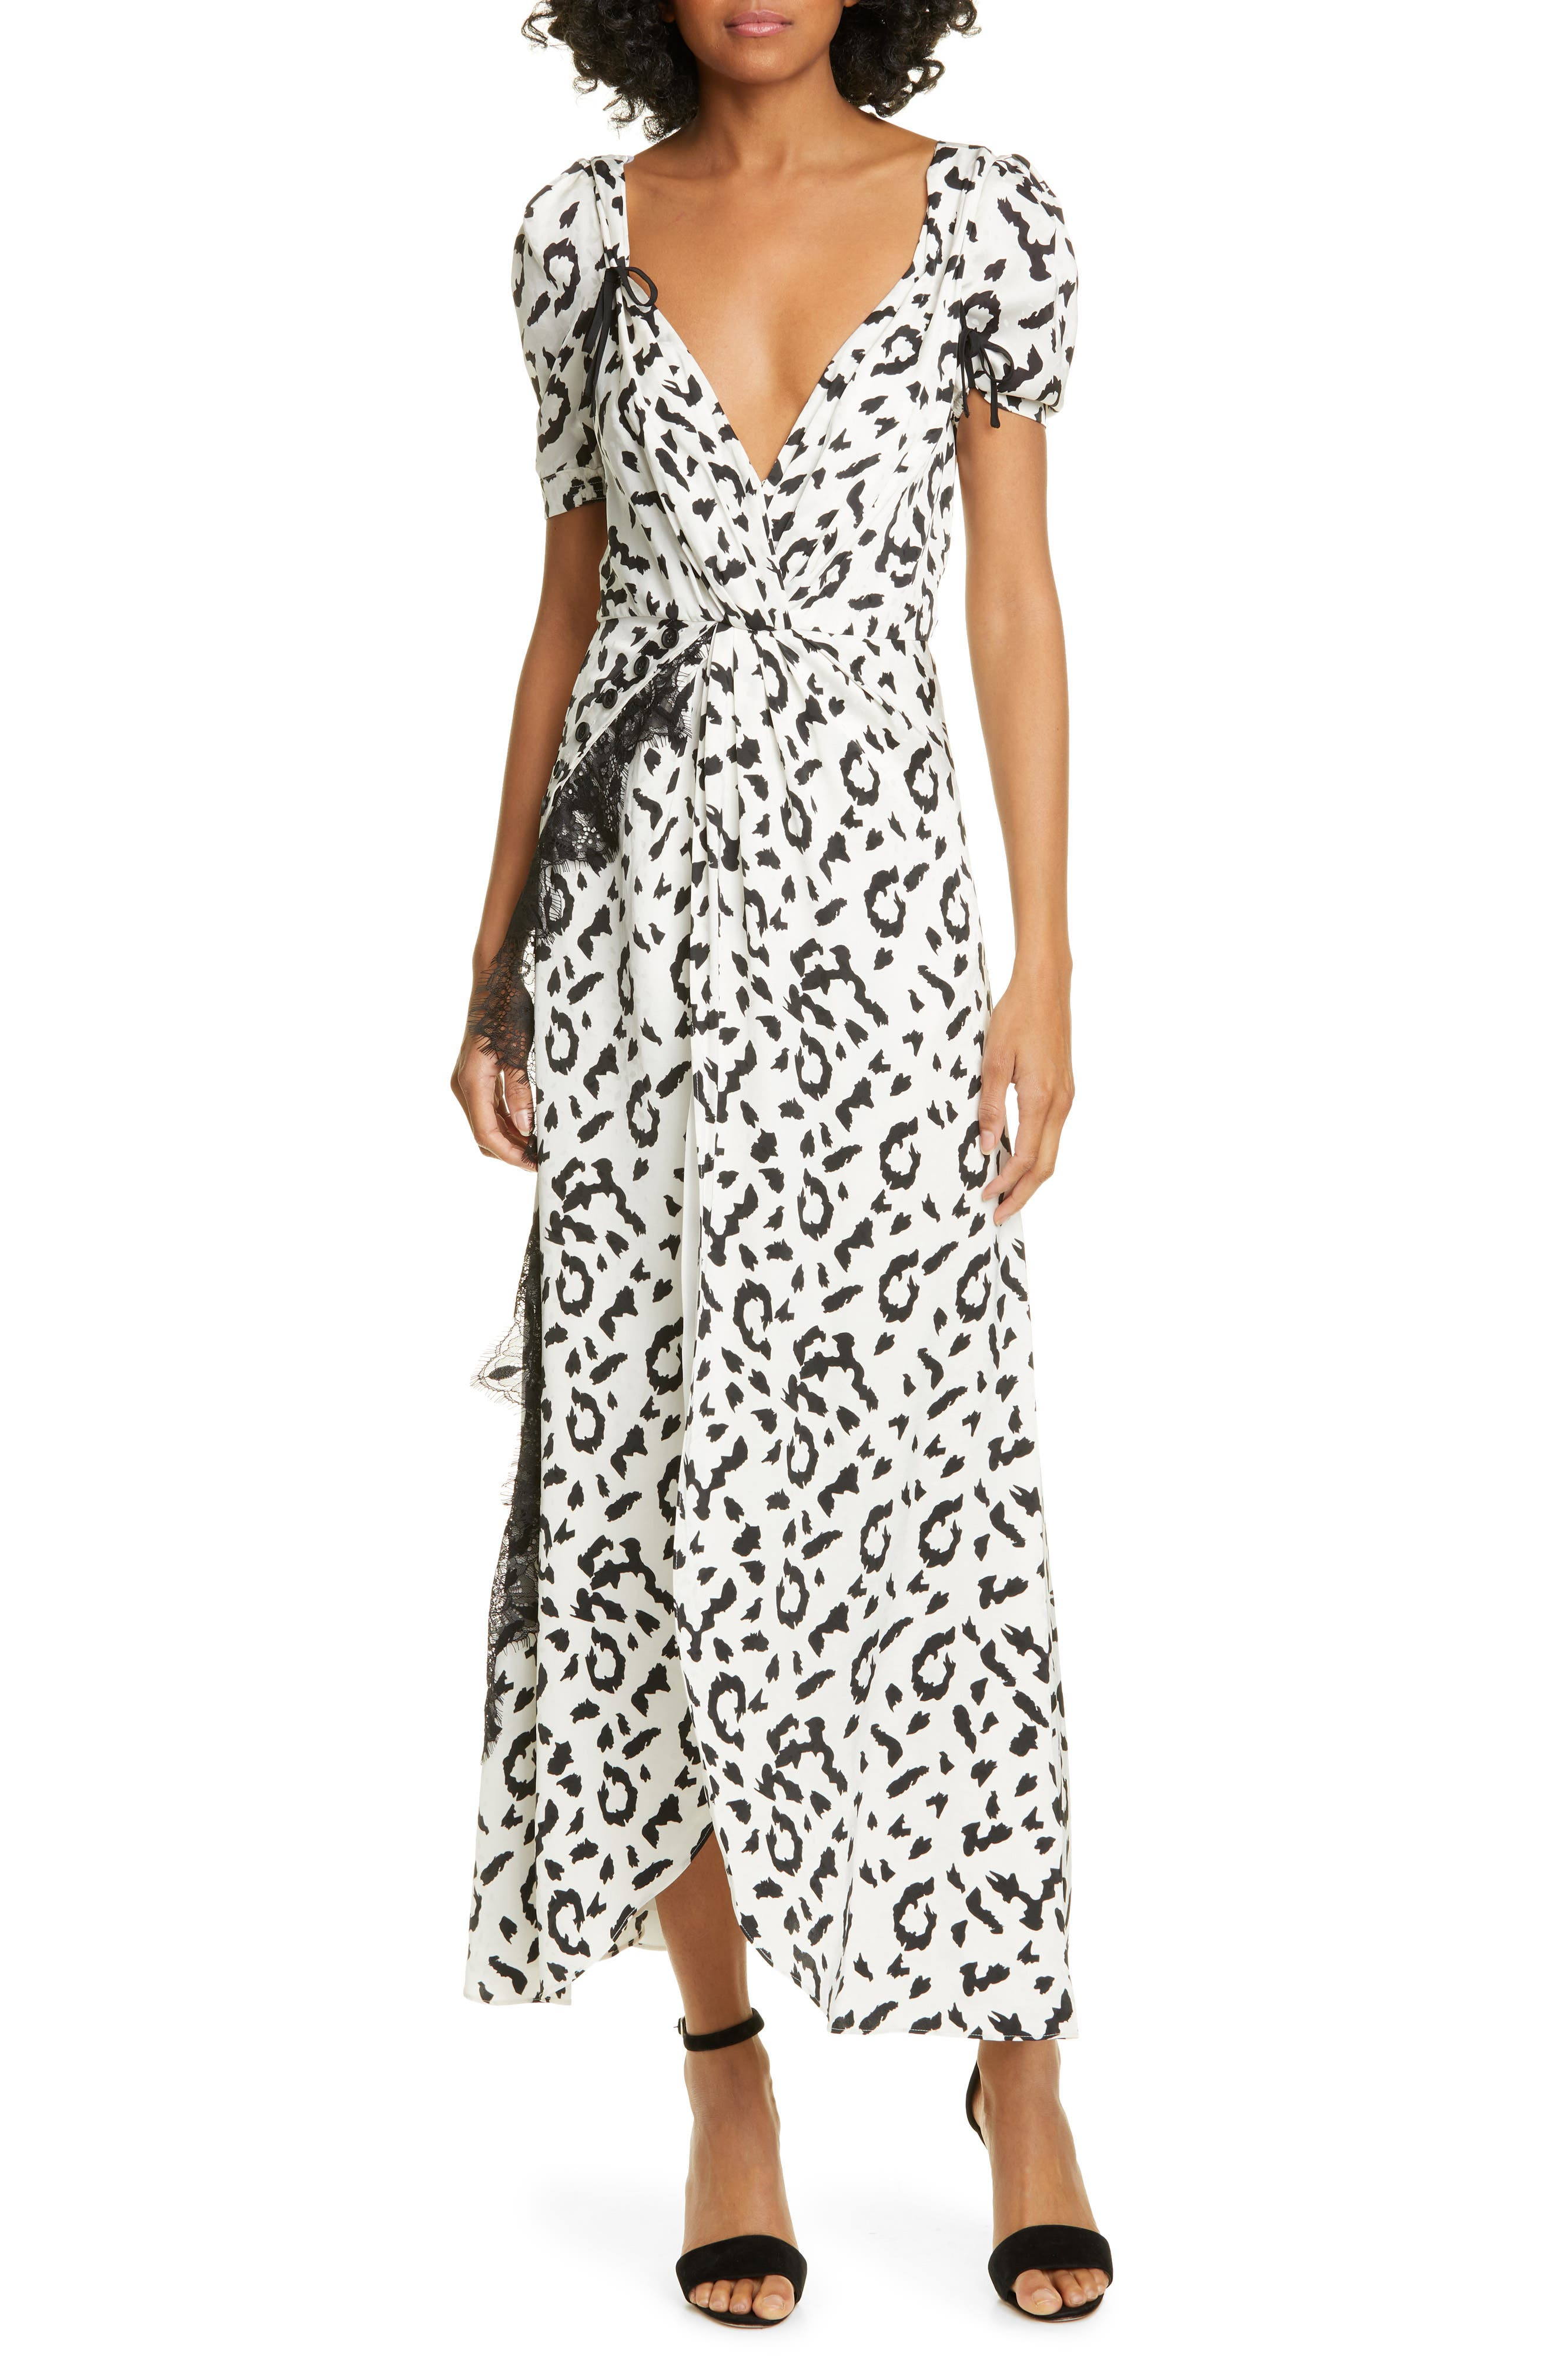 Self-Portrait Leopard Print Twist Front Dress, Ivory